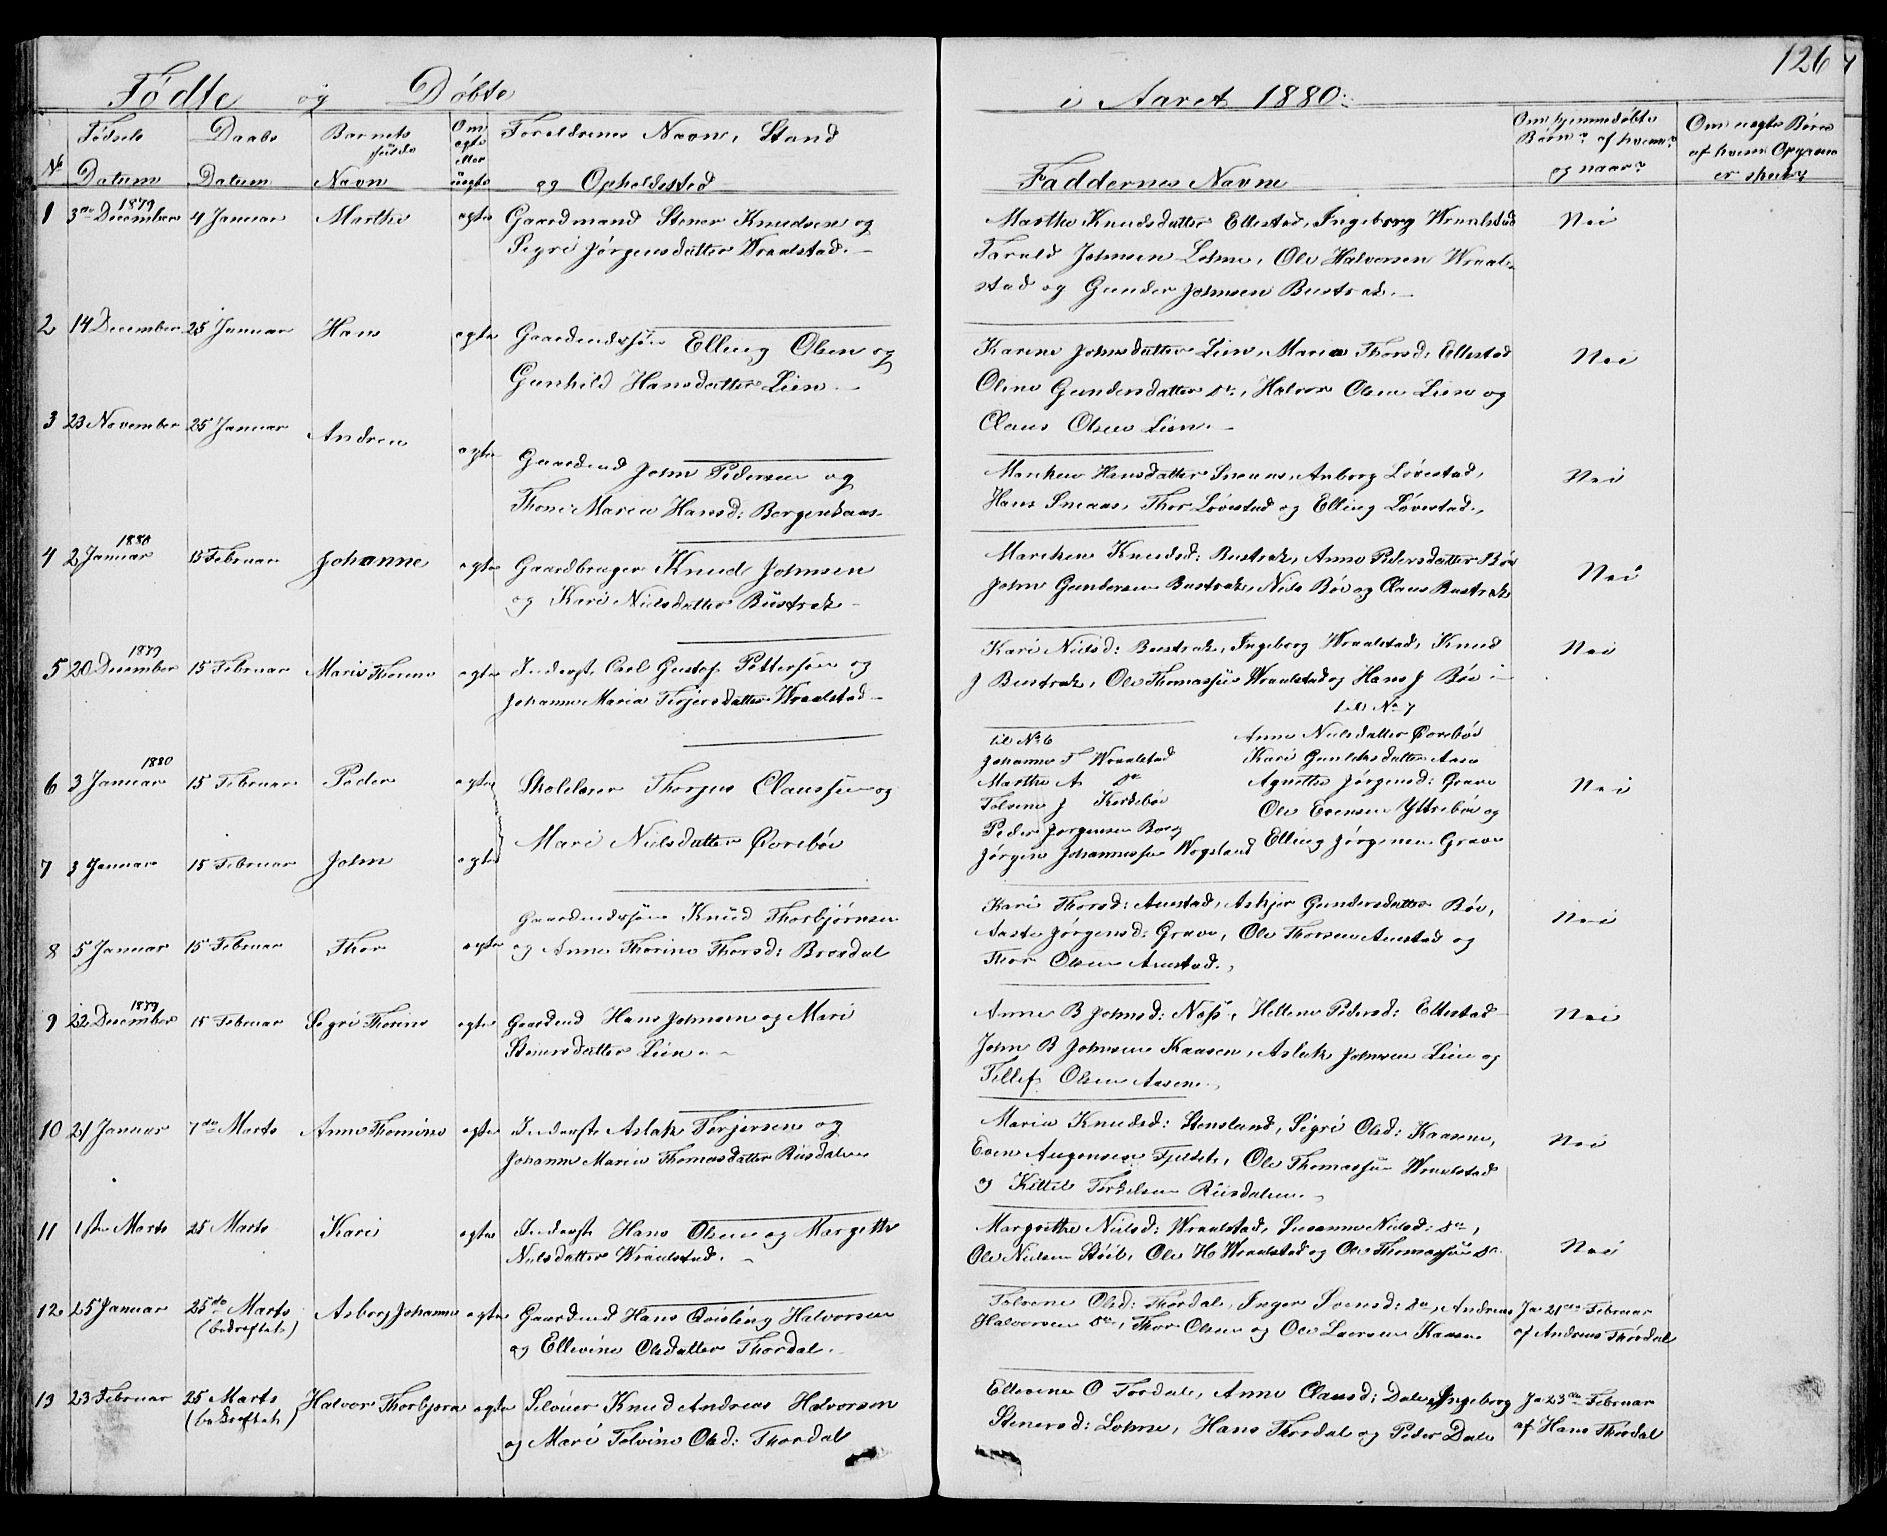 SAKO, Drangedal kirkebøker, G/Gb/L0001: Klokkerbok nr. II 1, 1856-1894, s. 126